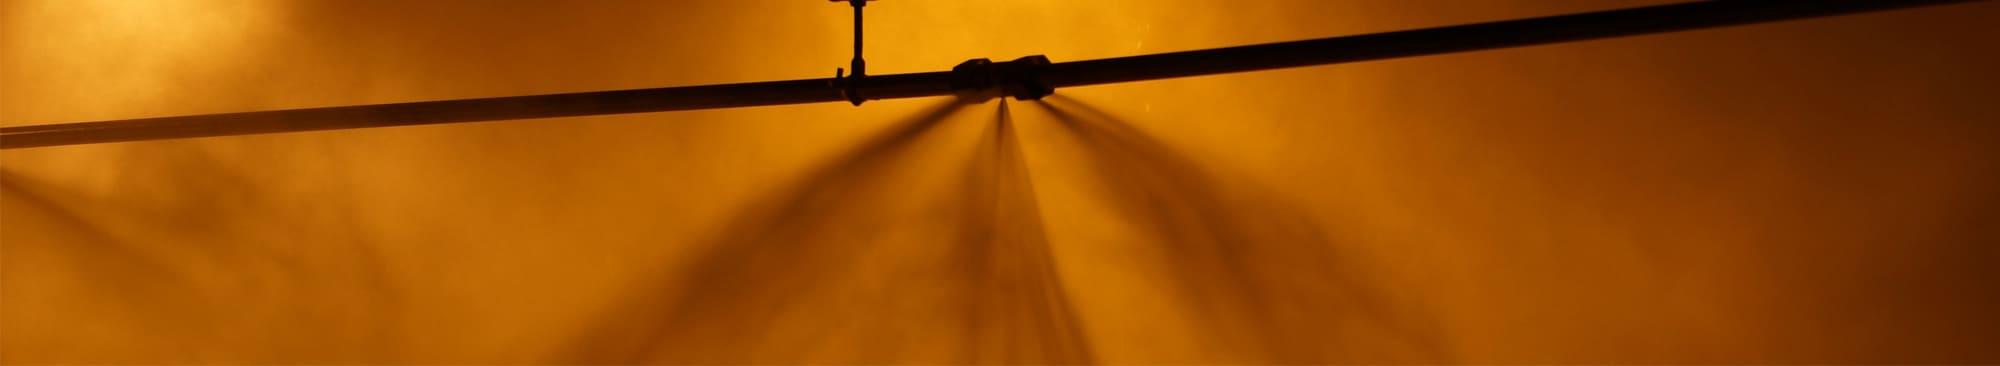 Water Mist System in Situ